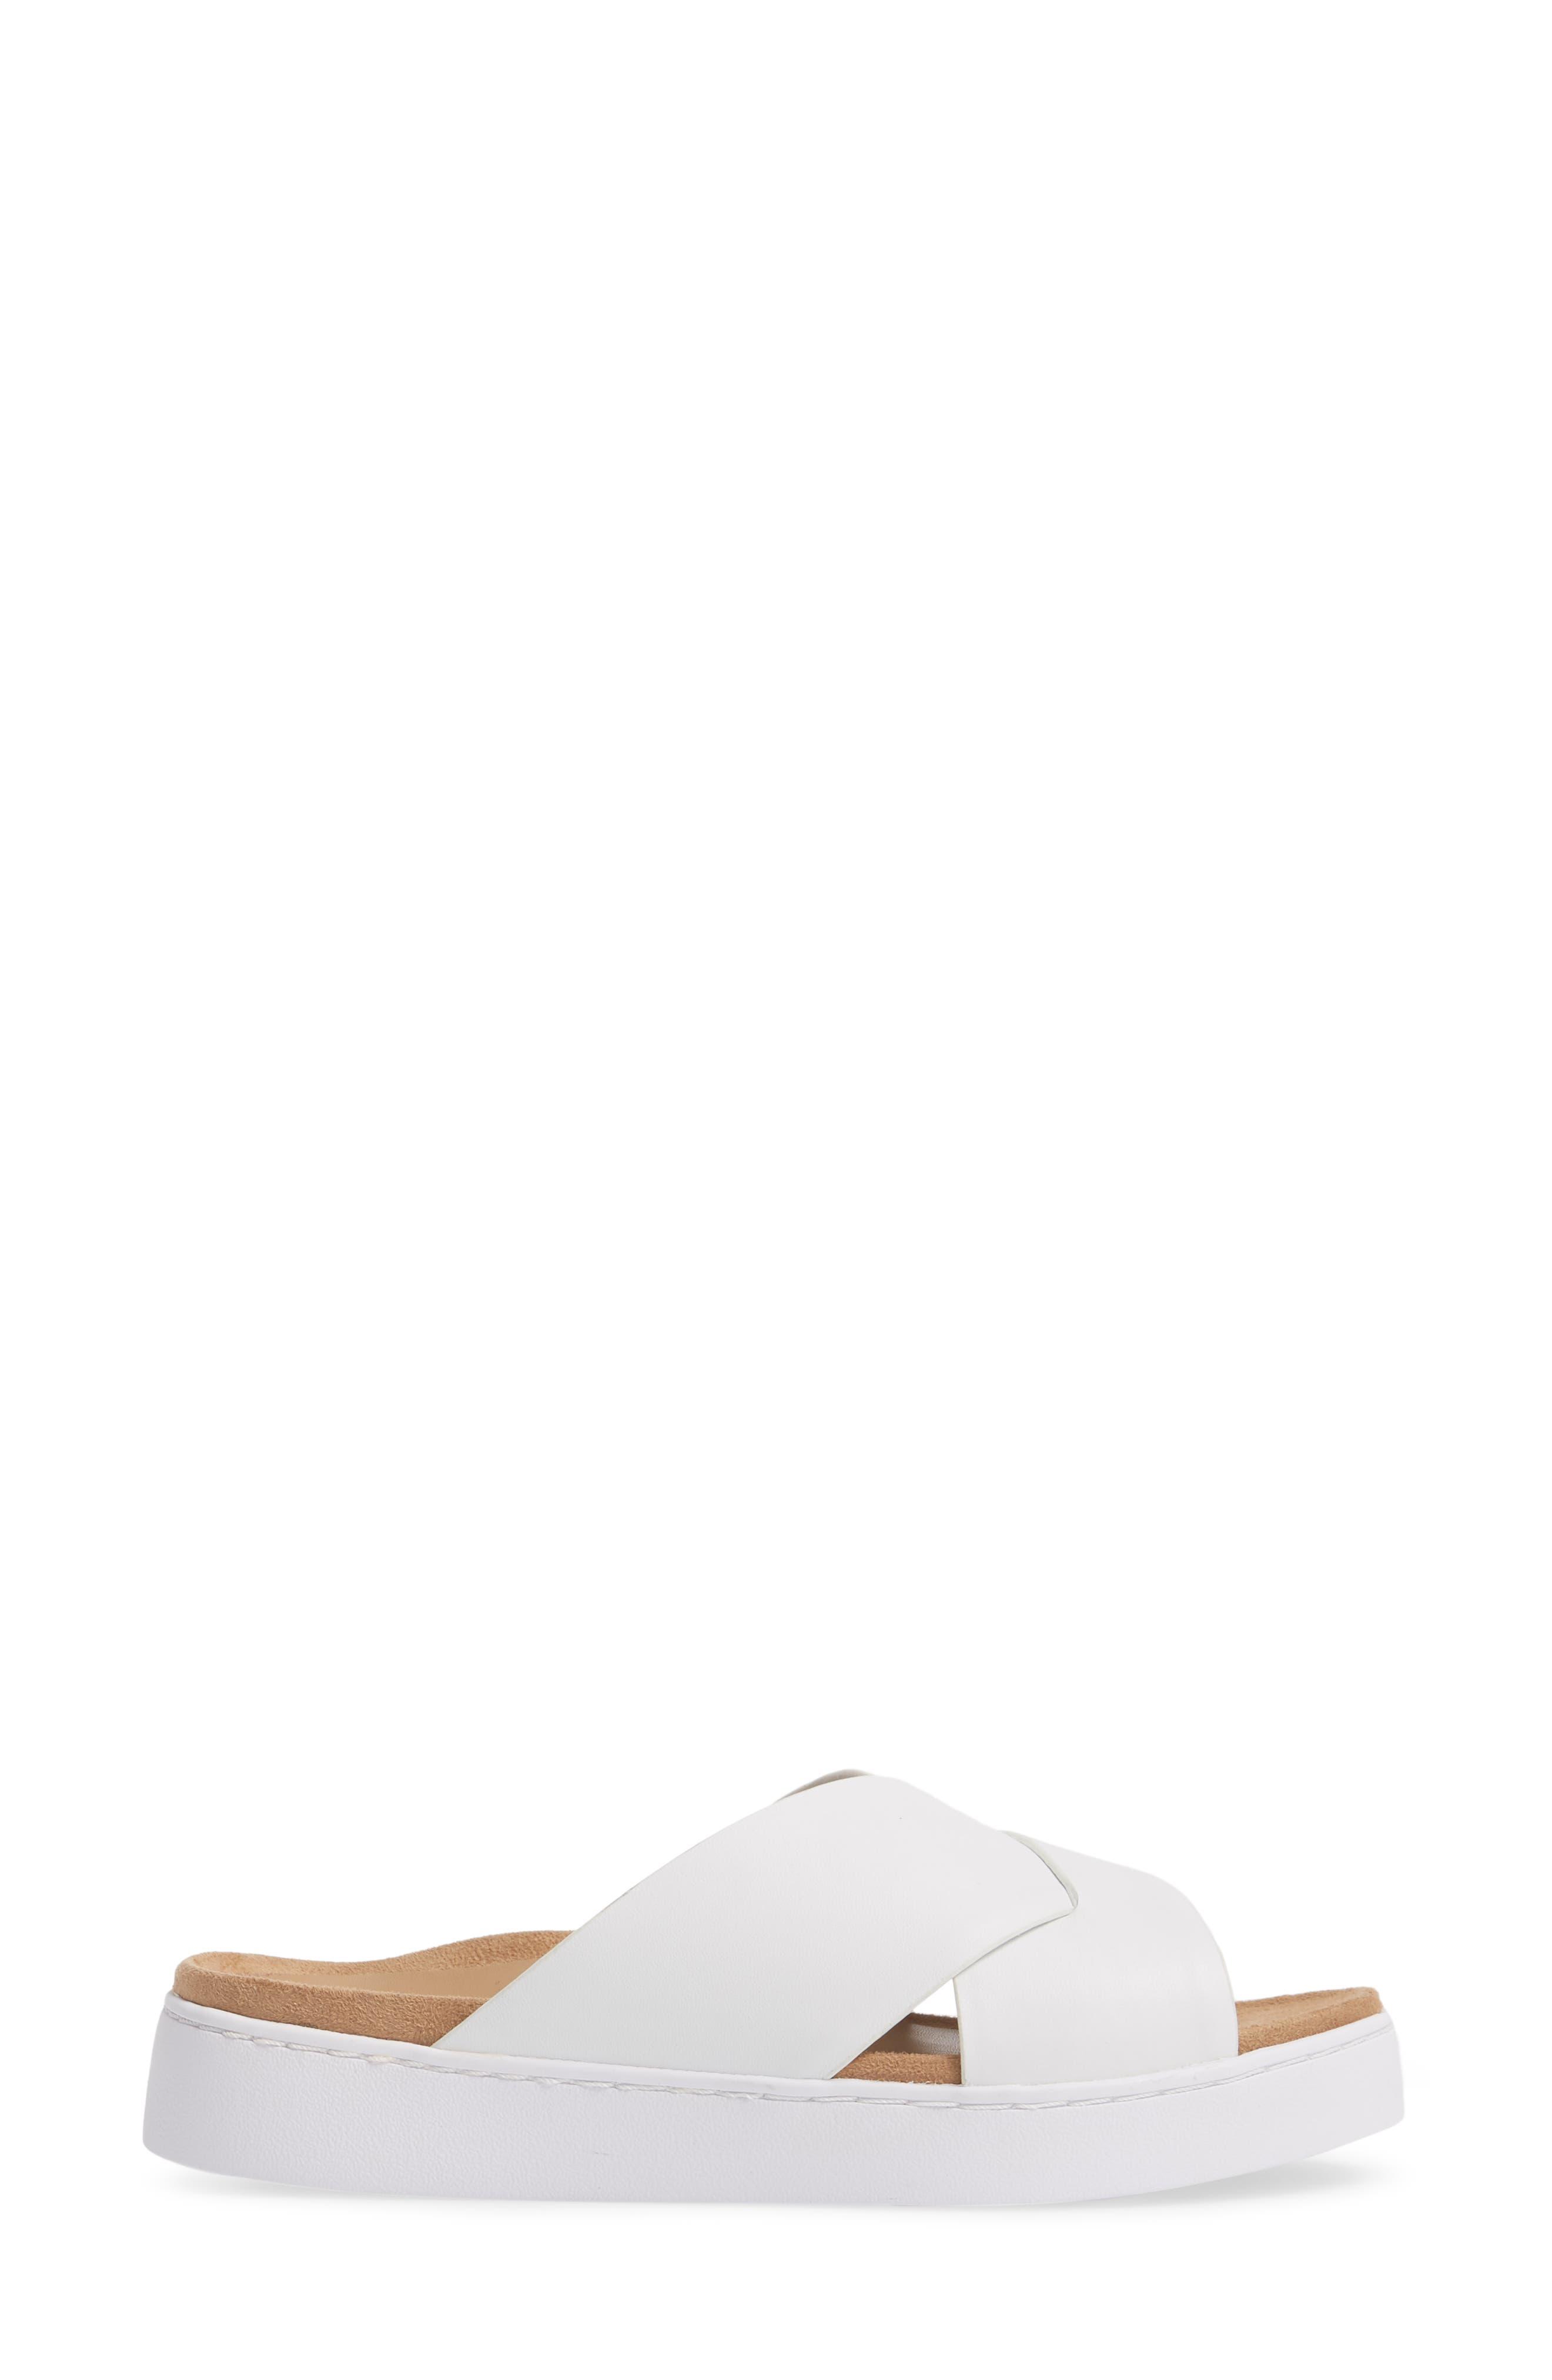 Lou Slide Sandal,                             Alternate thumbnail 3, color,                             White Leather